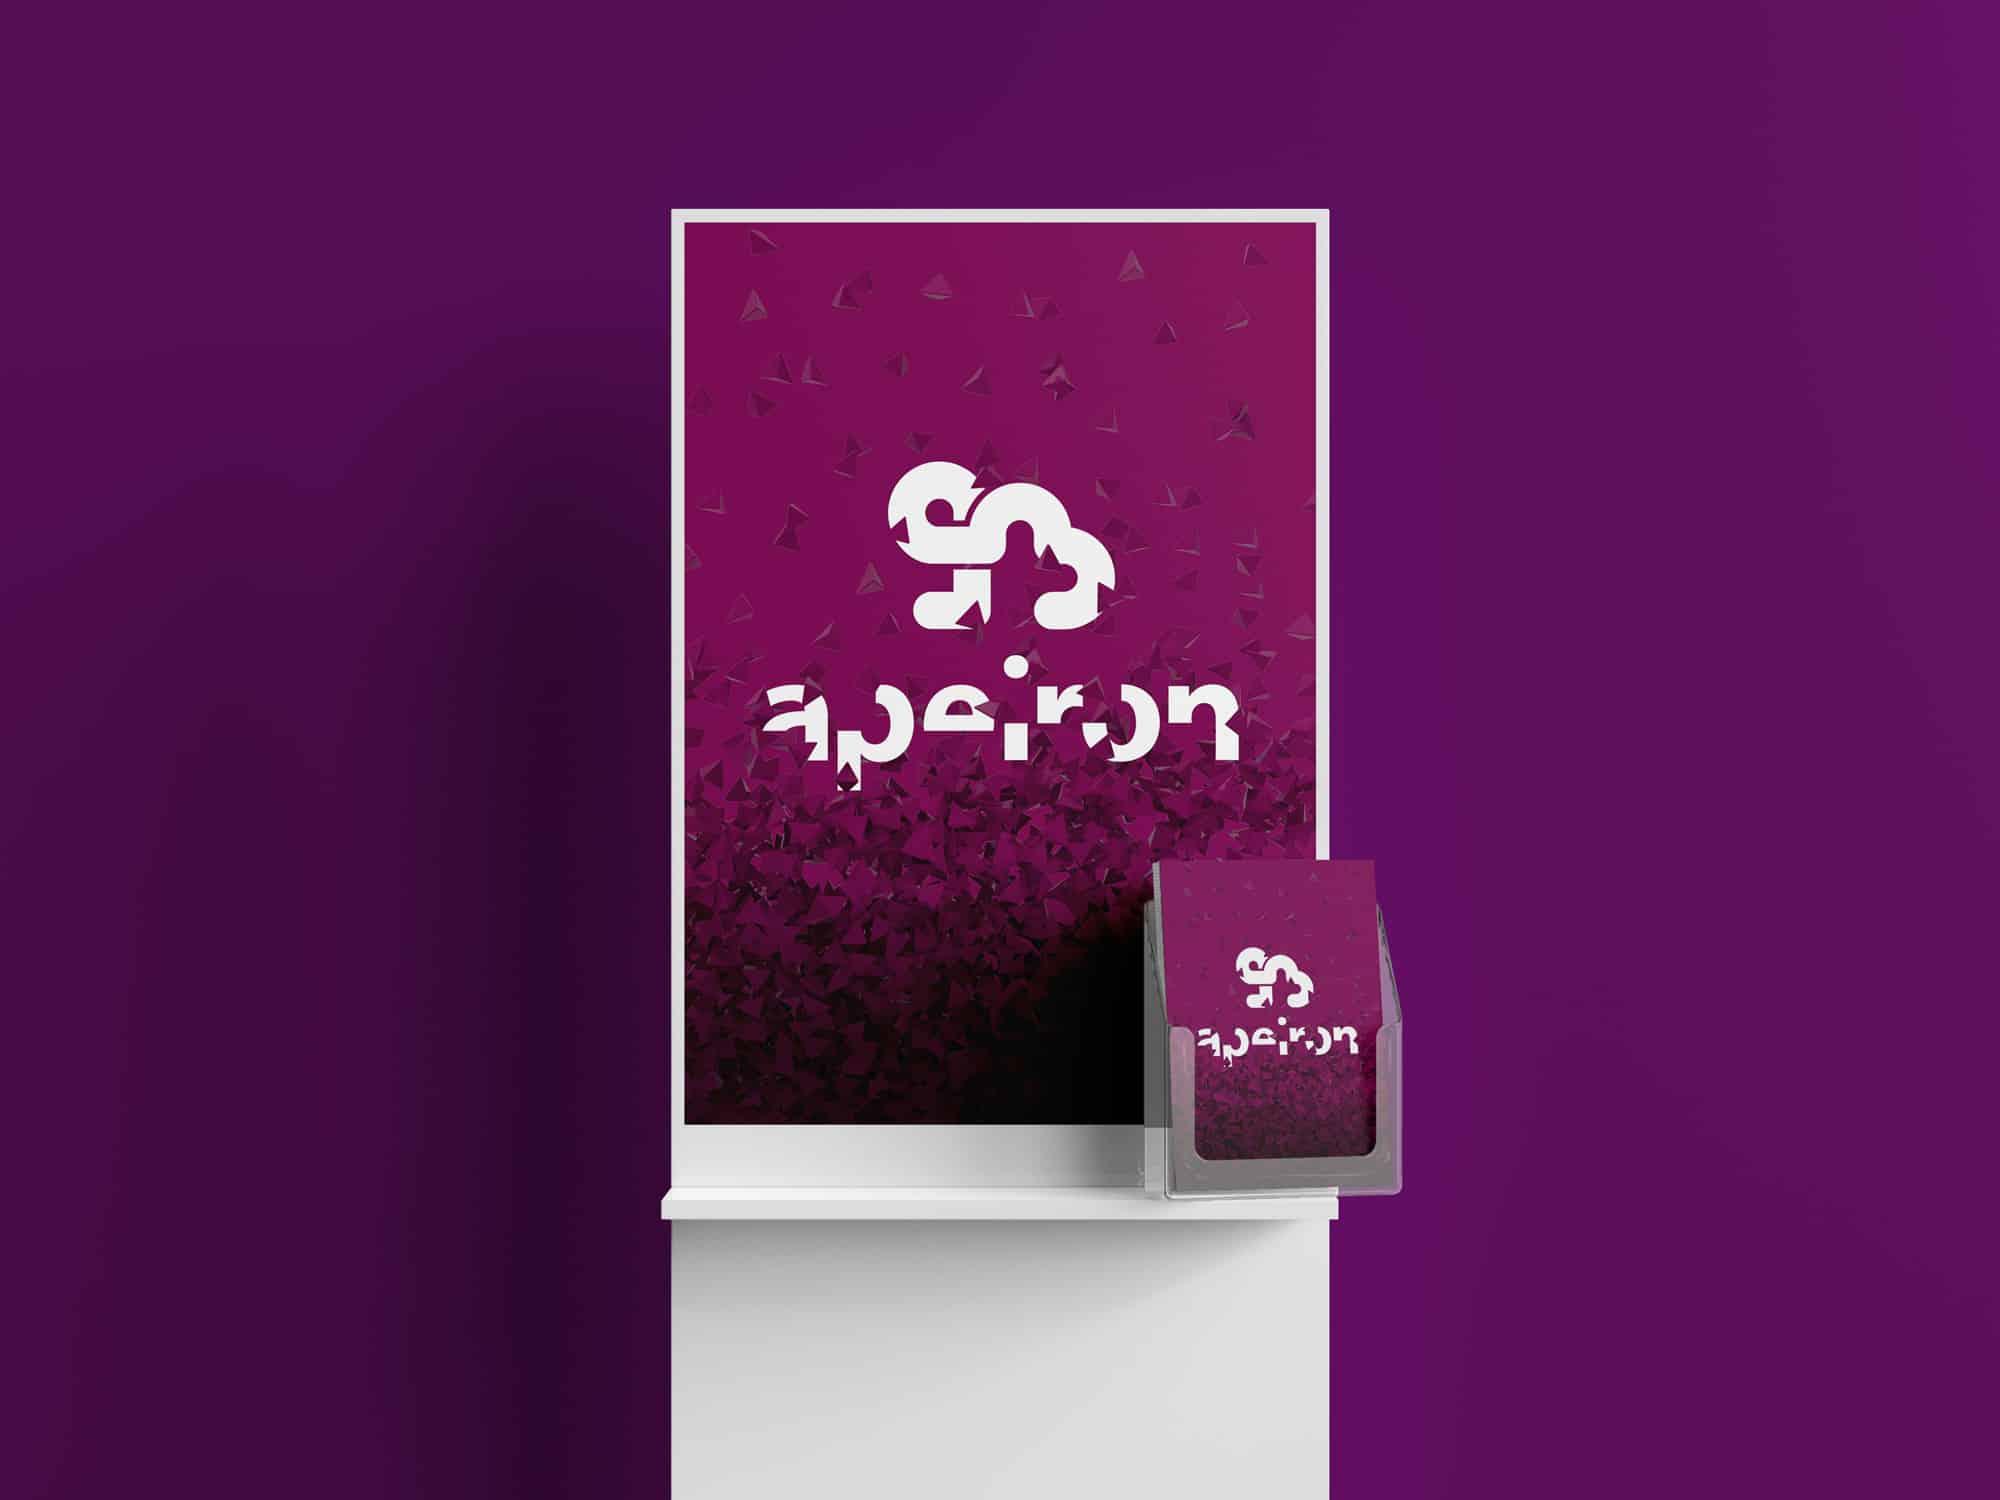 apeiron branding plakat